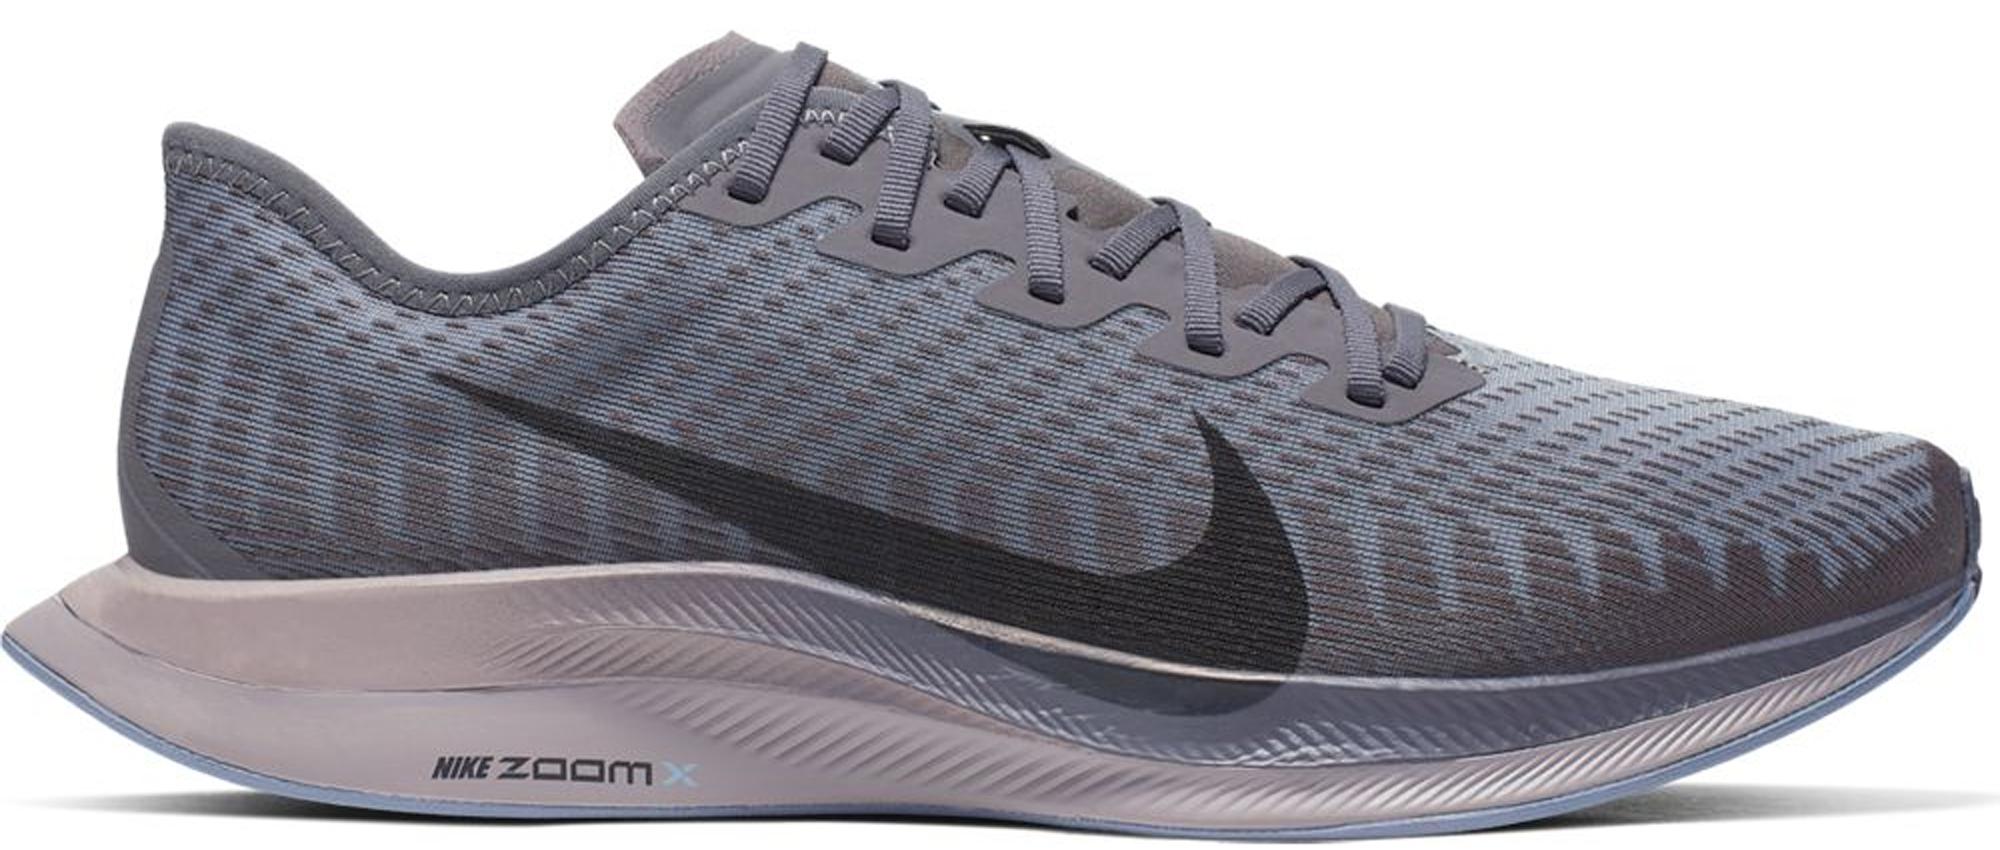 Nike Zoom Pegasus Turbo 2 Thunder Grey